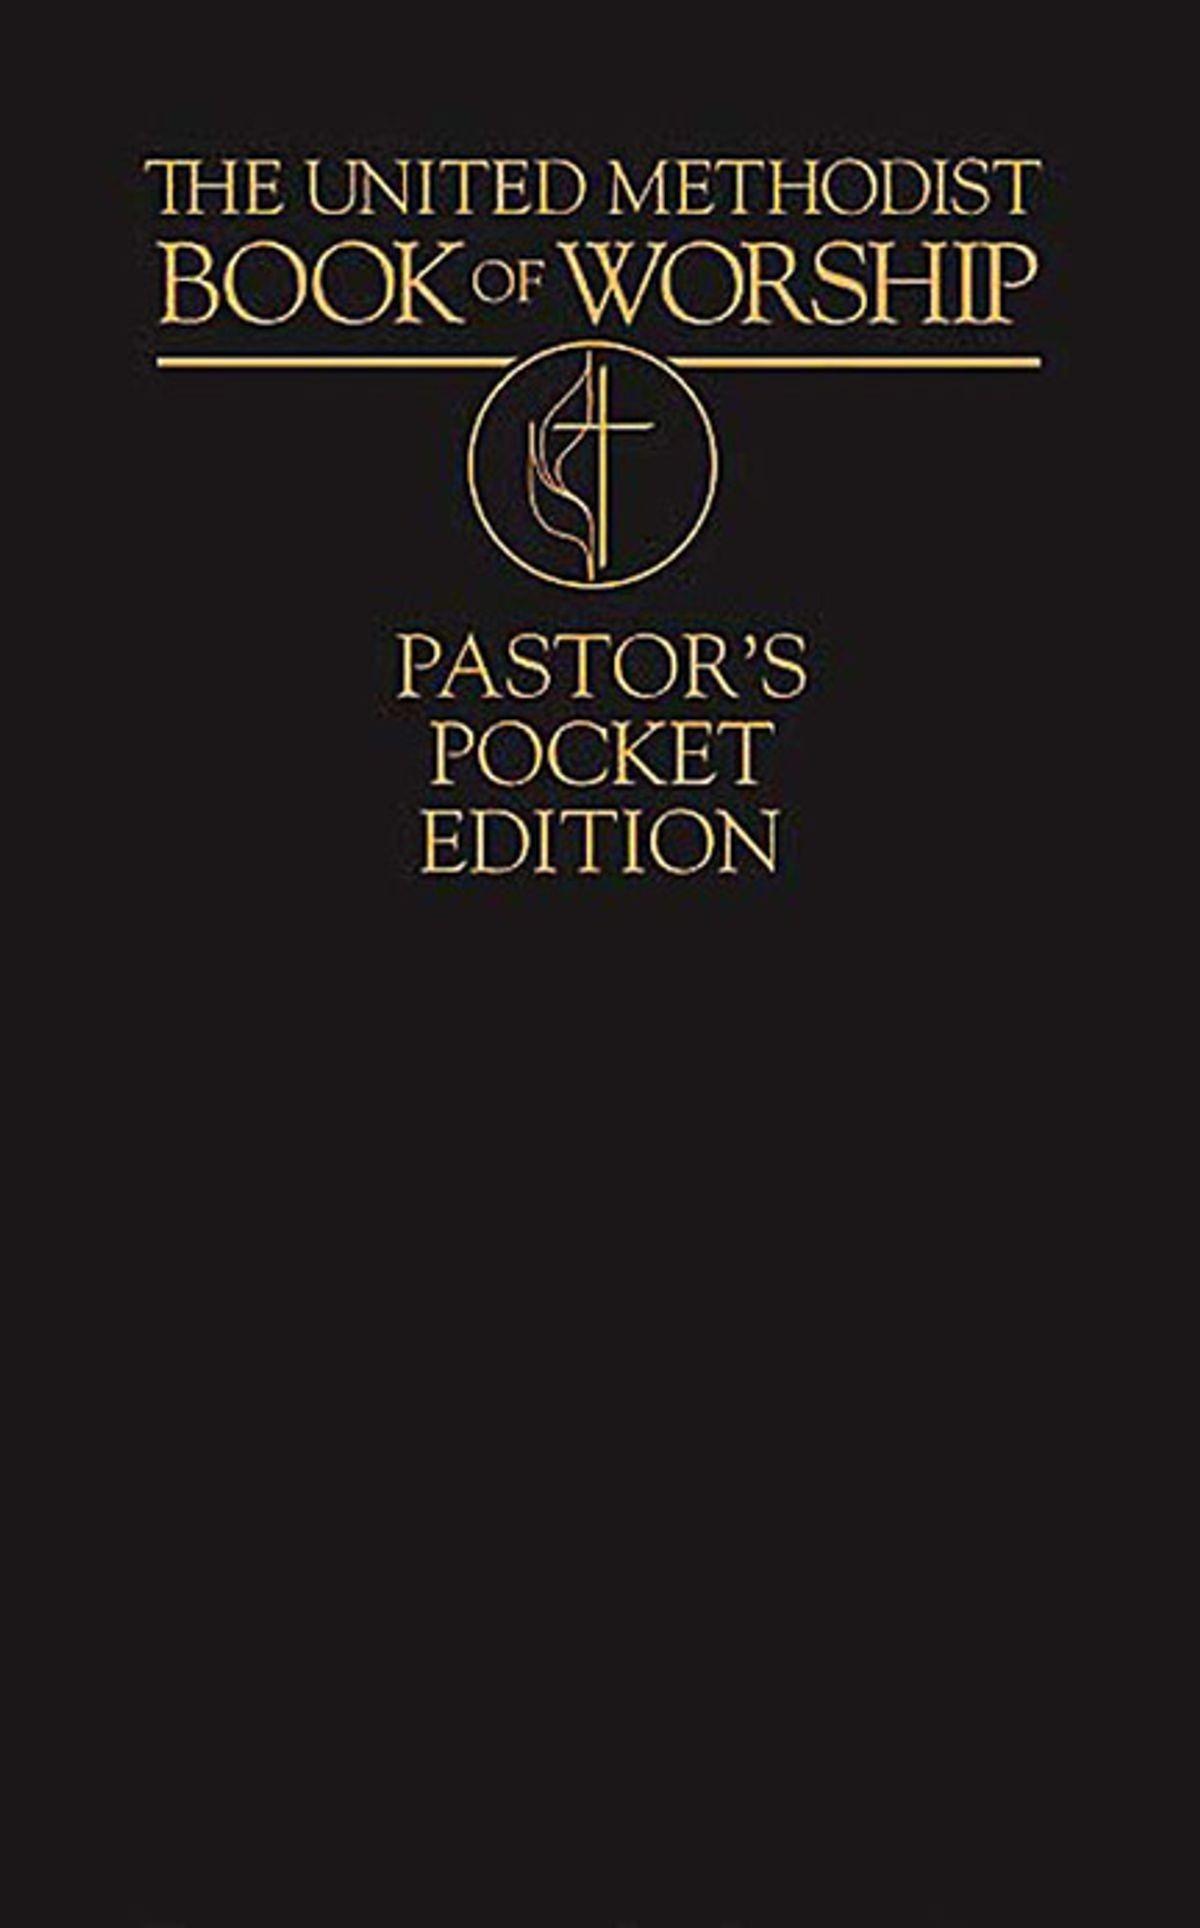 The United Methodist Book Of Worship Pastor's Pocket Edition Ebook Abingdon Press - Rakuten Kobo  Free Printable United Methodists Liturgical Calendars For 2020